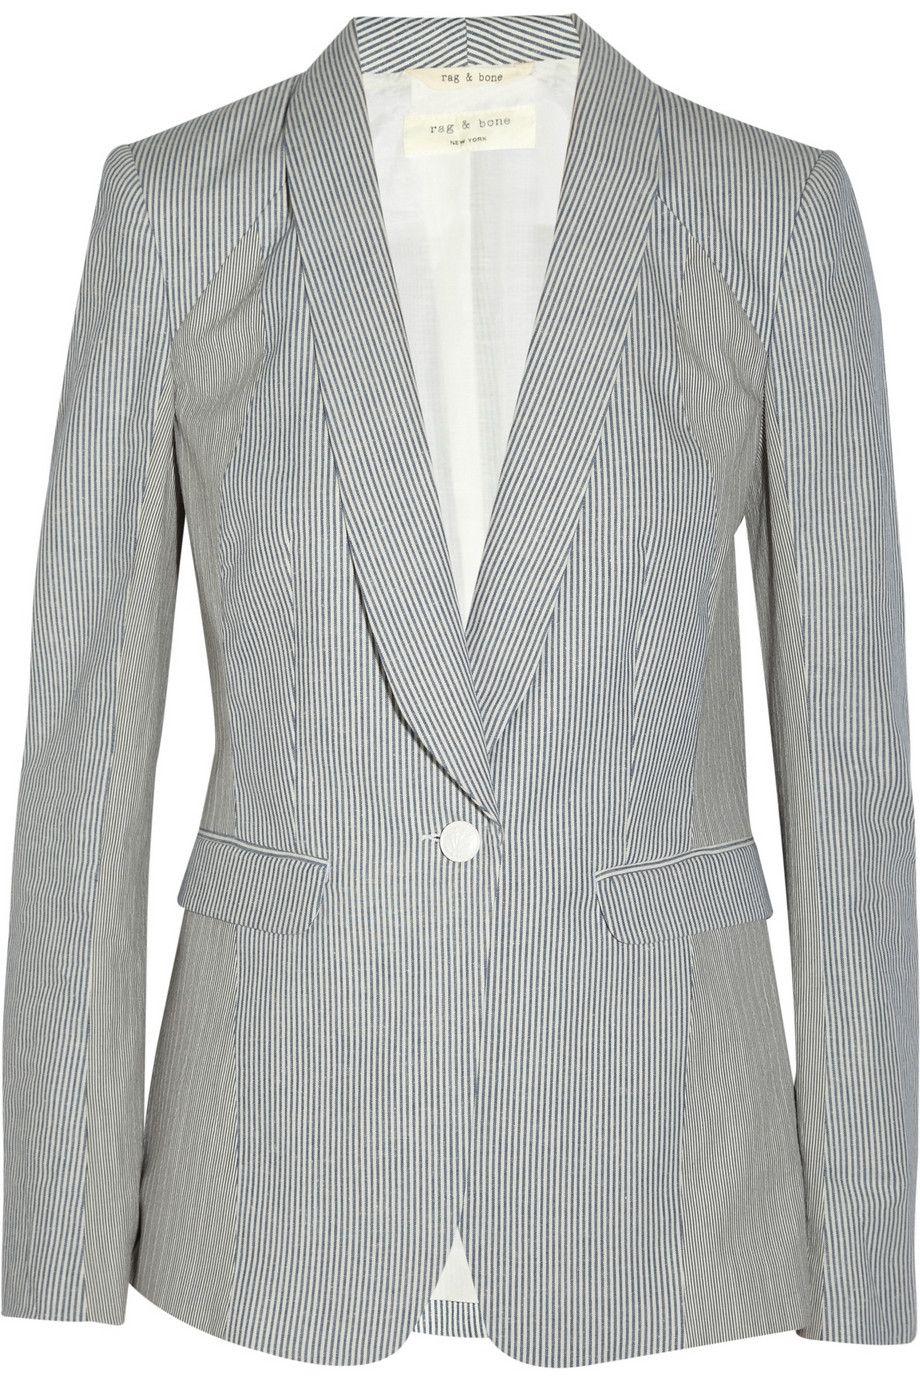 Rag & bone|Jefferson striped cotton and linen-blend blazer|NET-A-PORTER.COM